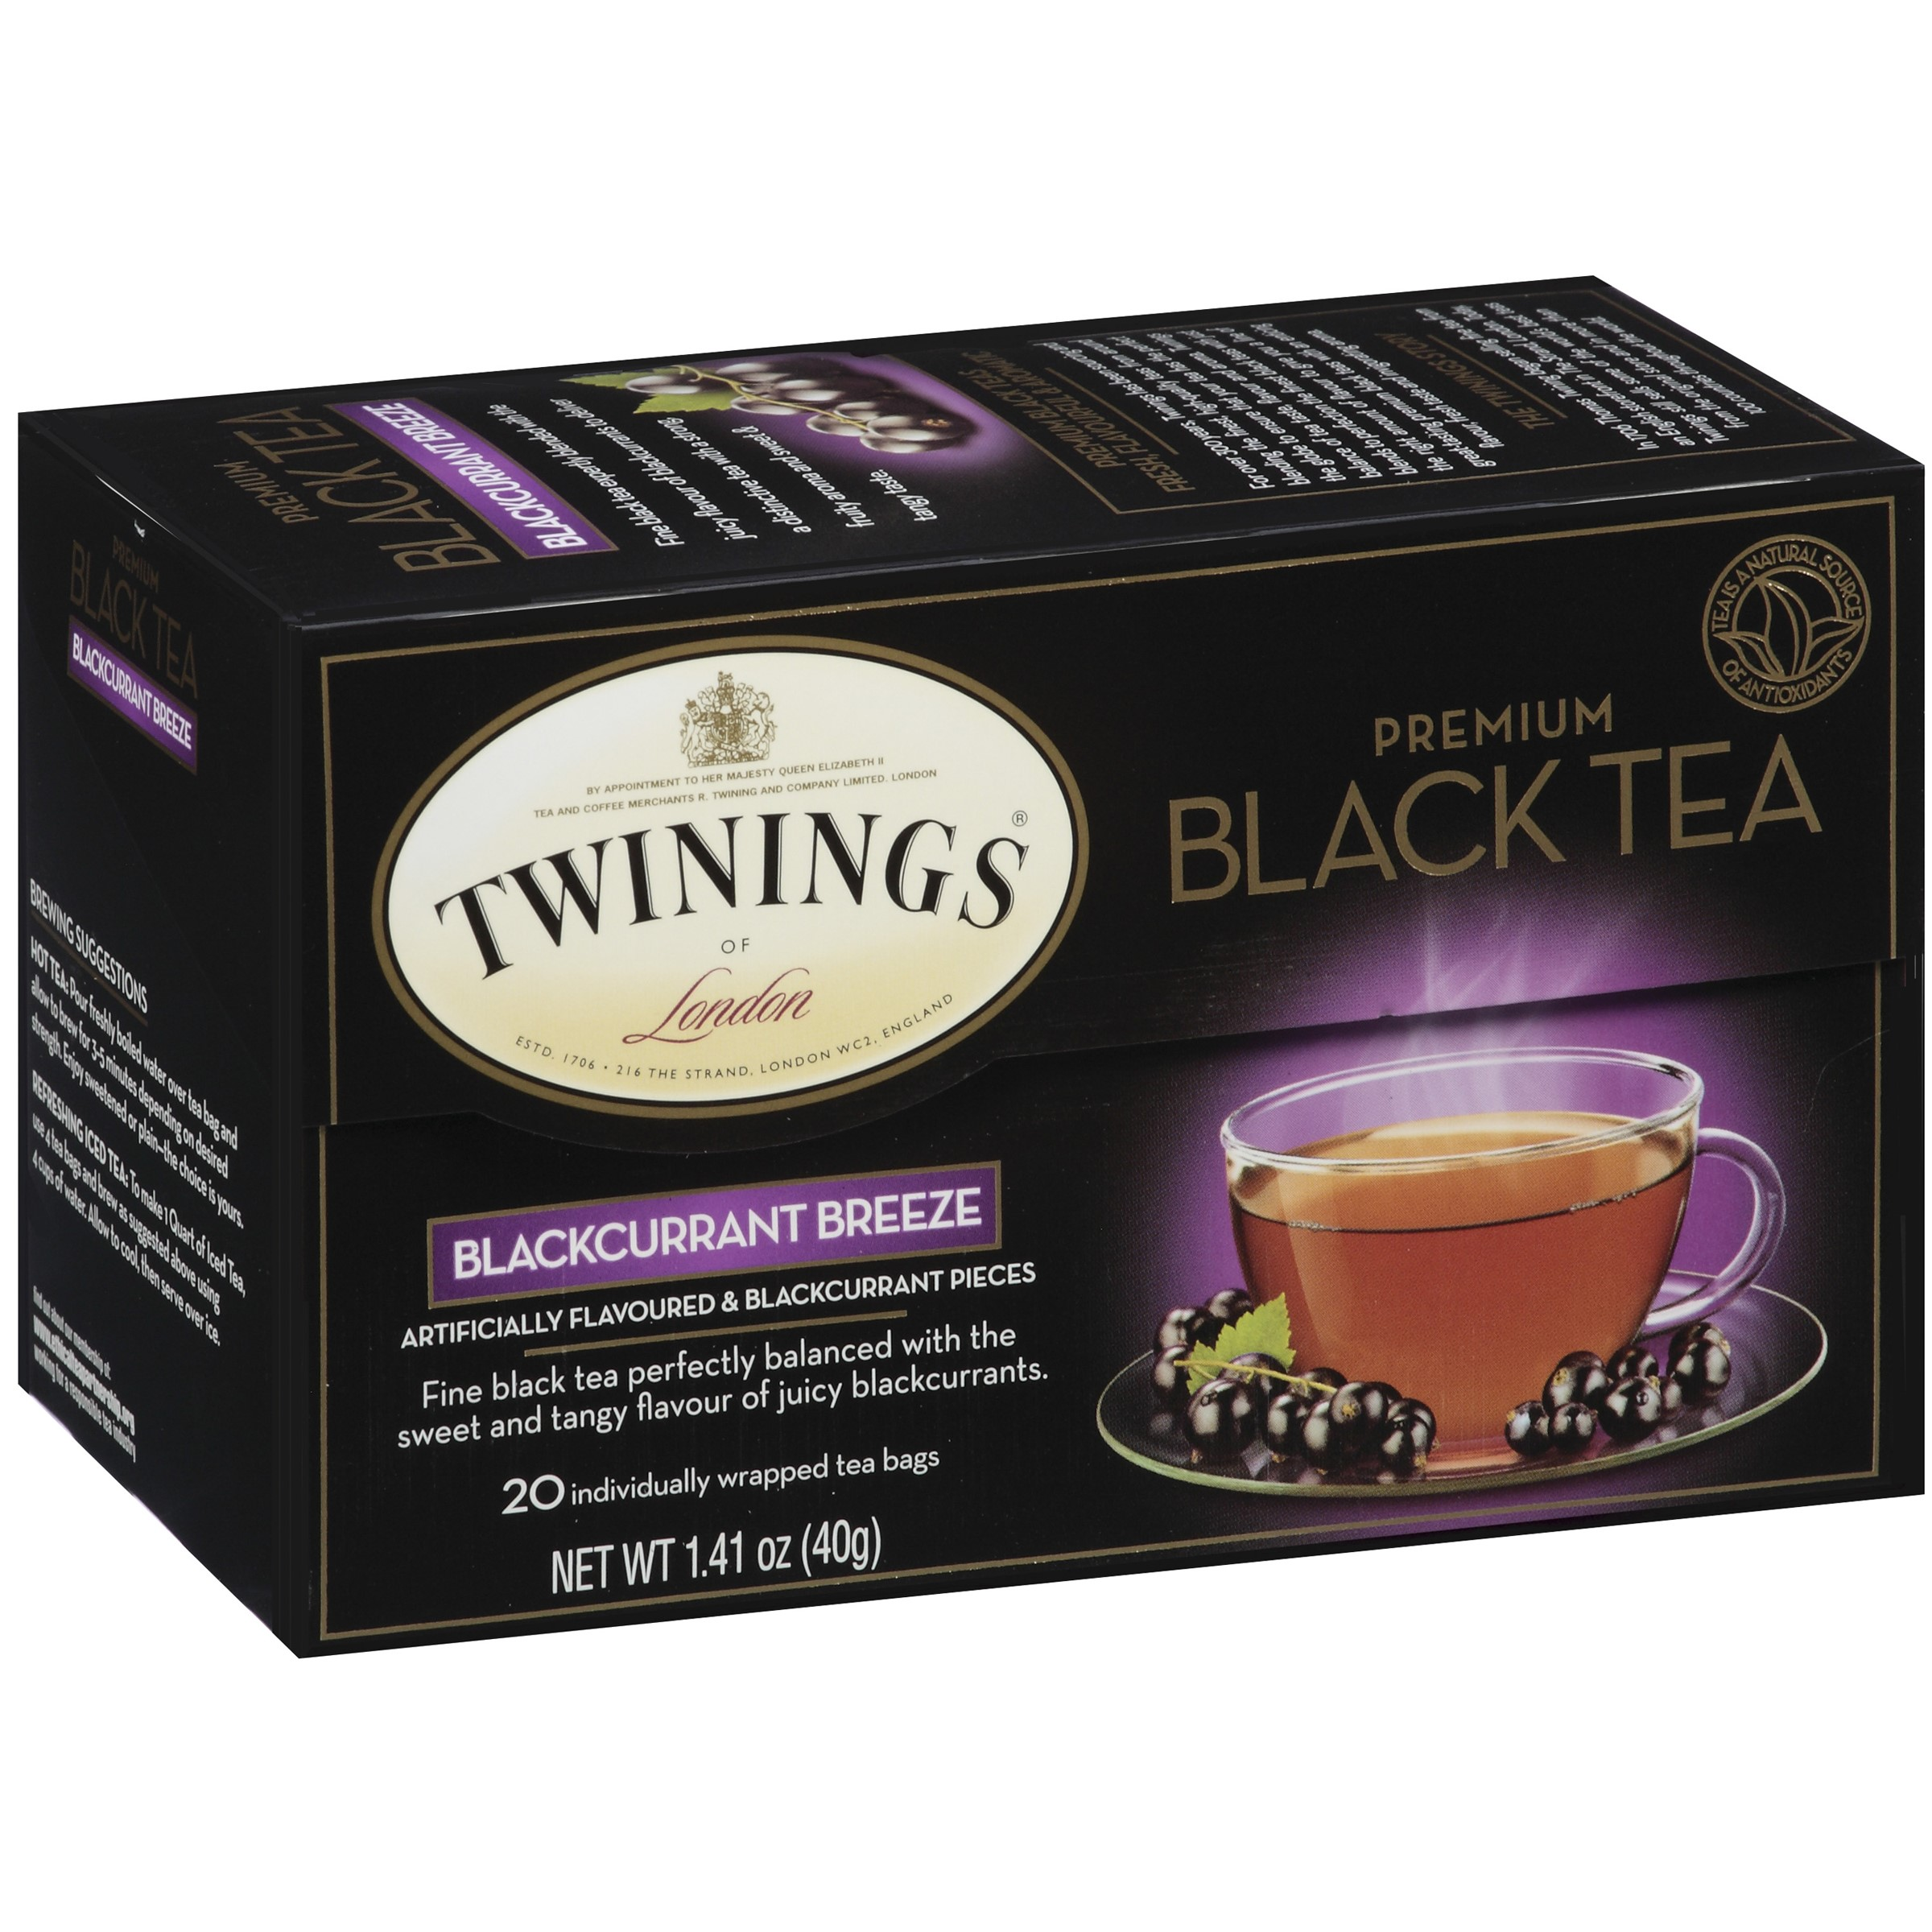 Twinings Premium Blackcurrant Breeze Black Tea 20 Tea Bags